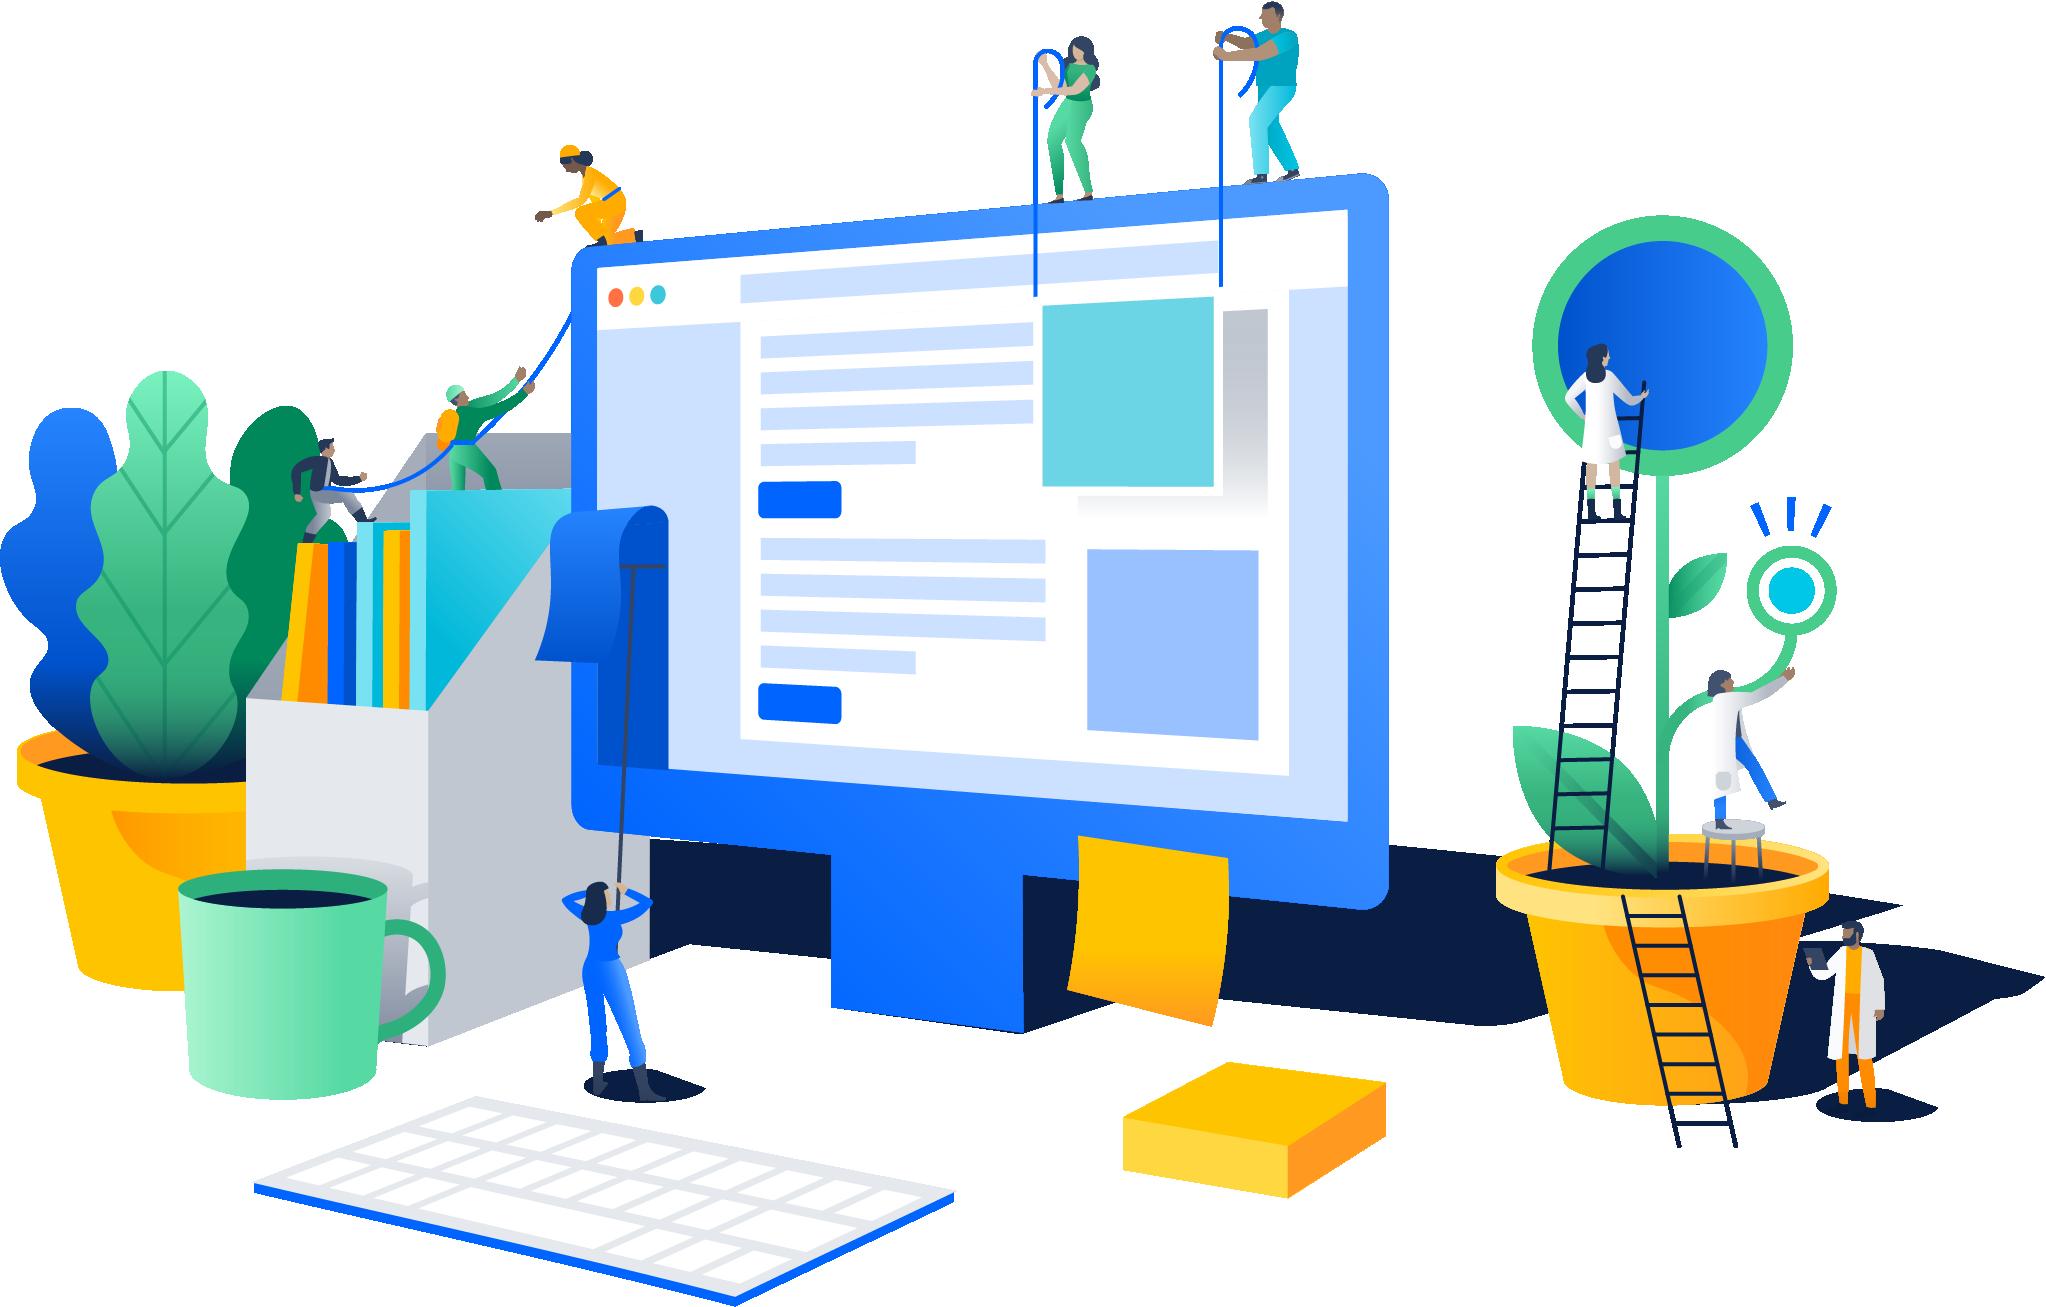 Teamwork clipart platform. Software development and collaboration